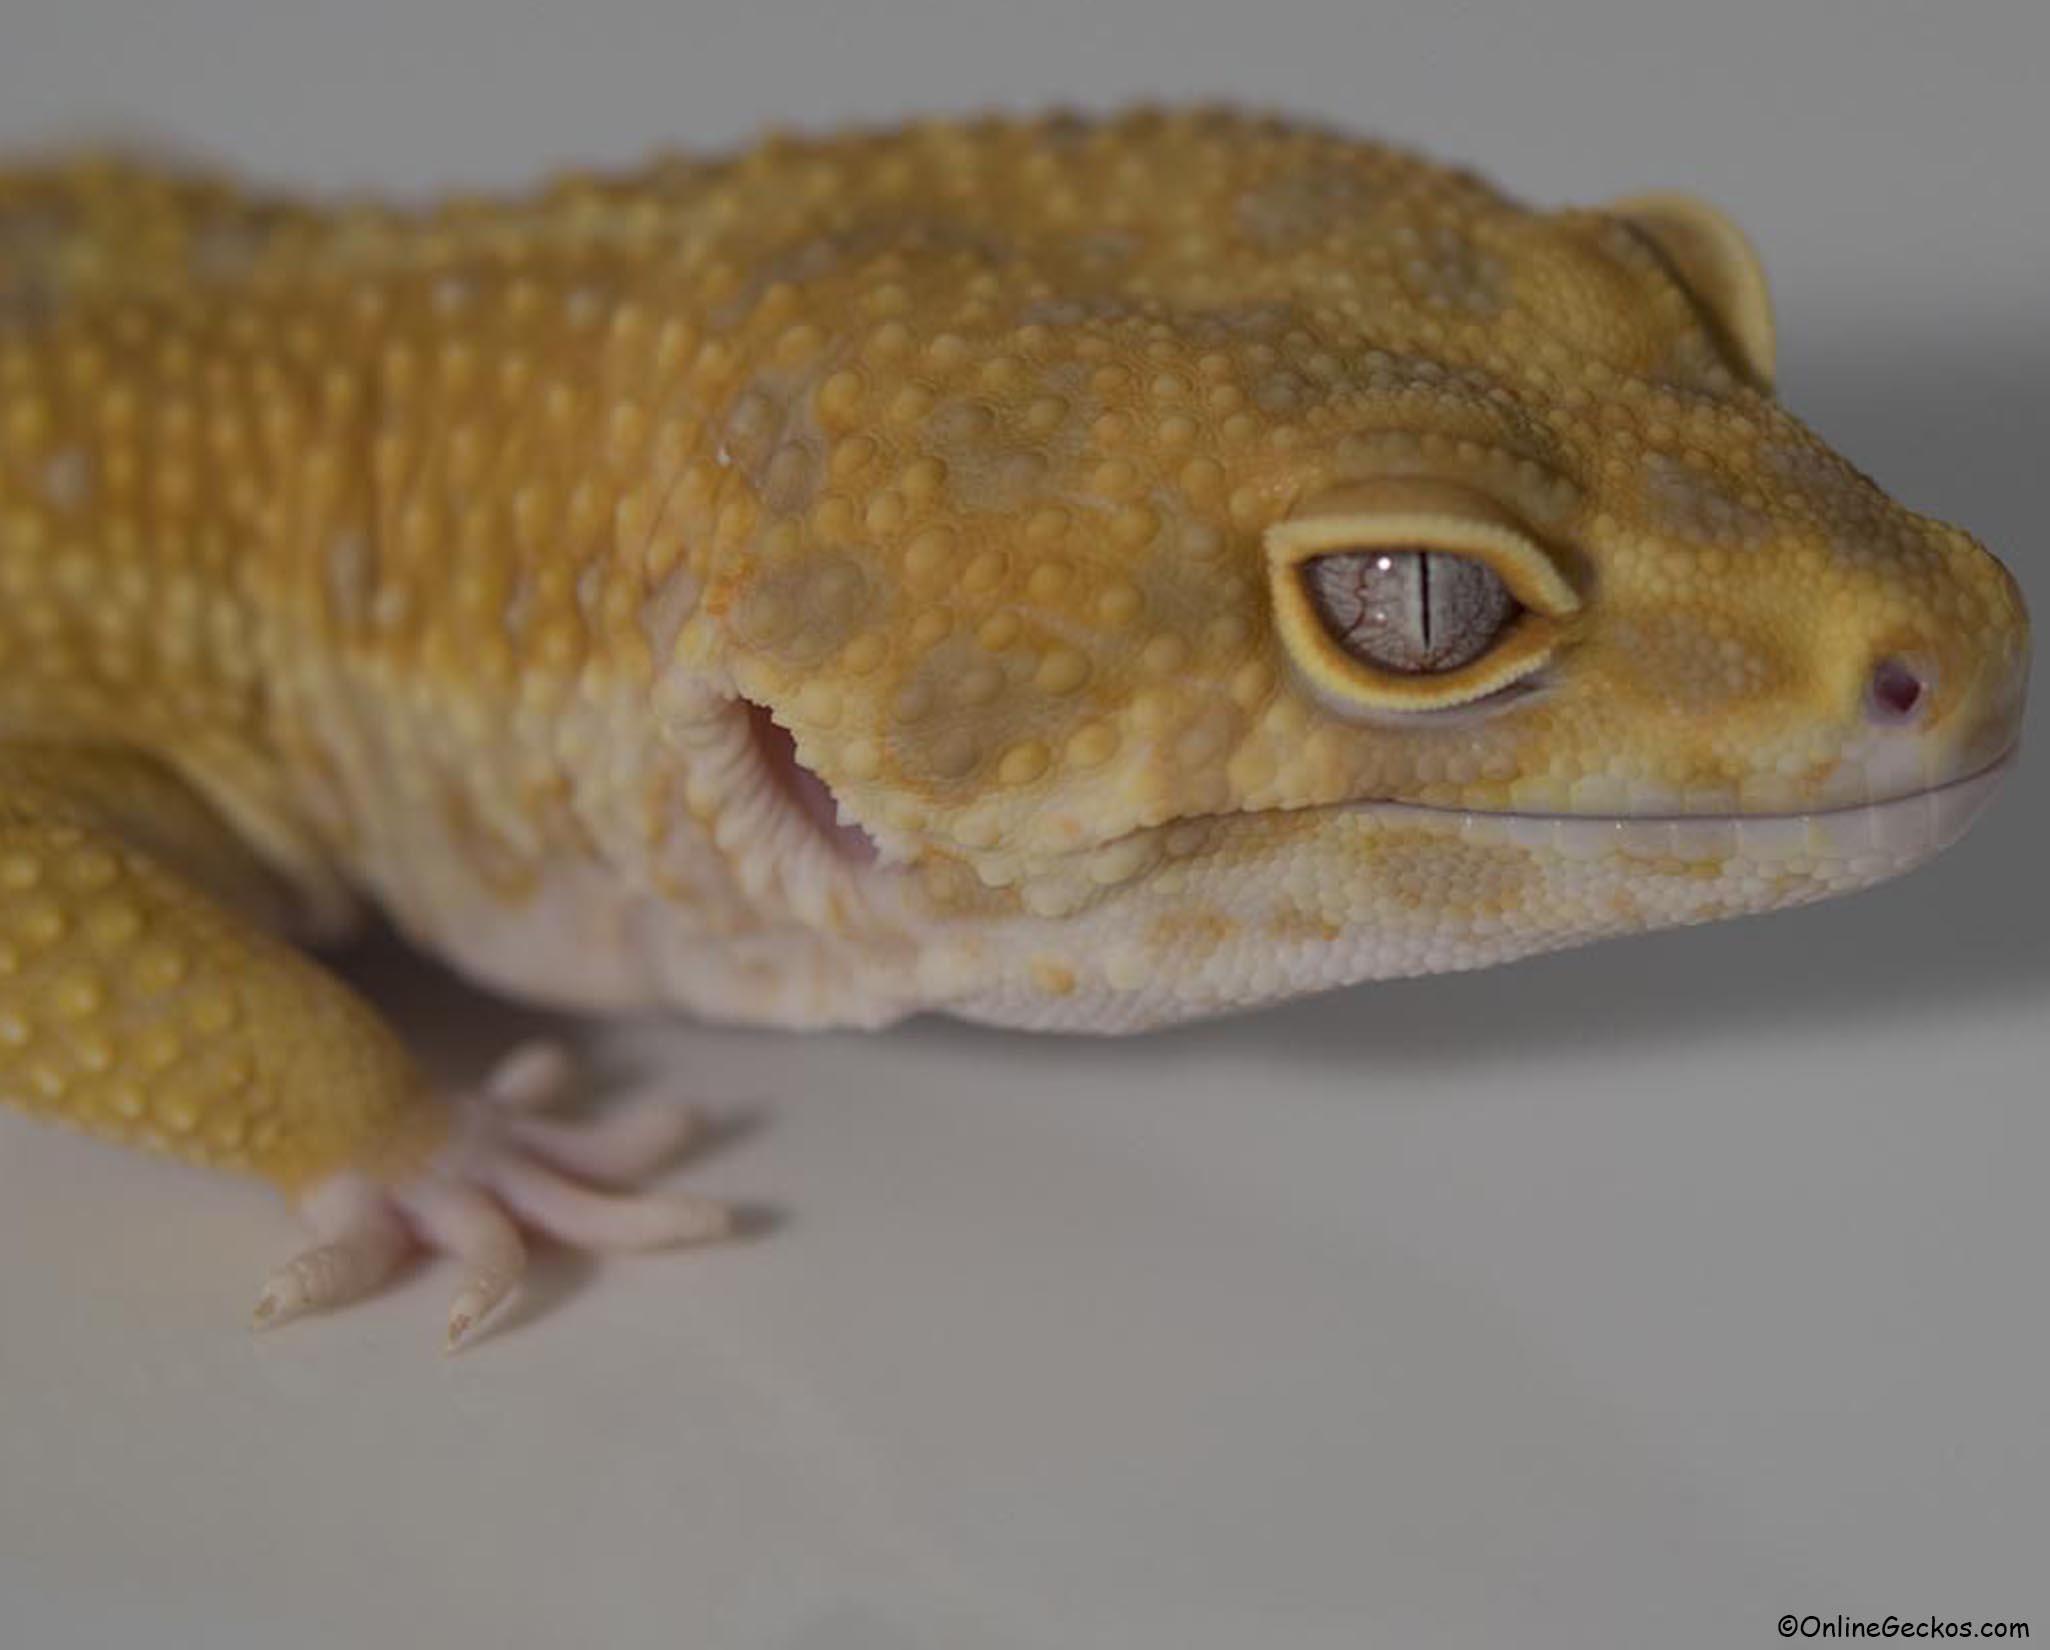 Basic Leopard Gecko Tank Setup Leopard Geckos For Sale